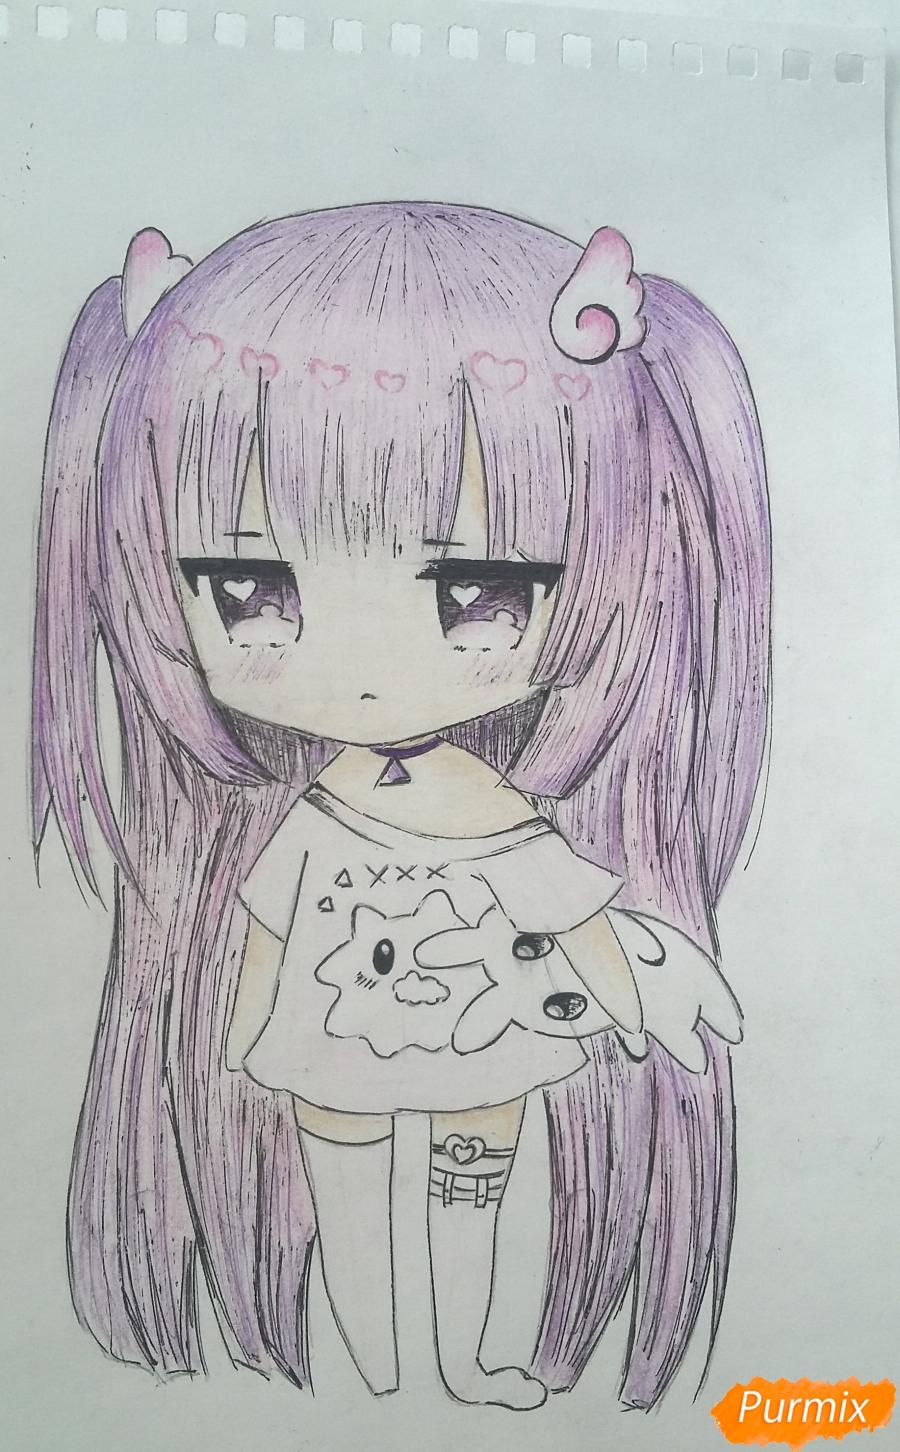 Рисуем милую чиби-тян в пижаме и игрушкой в руке карандашами - шаг 16